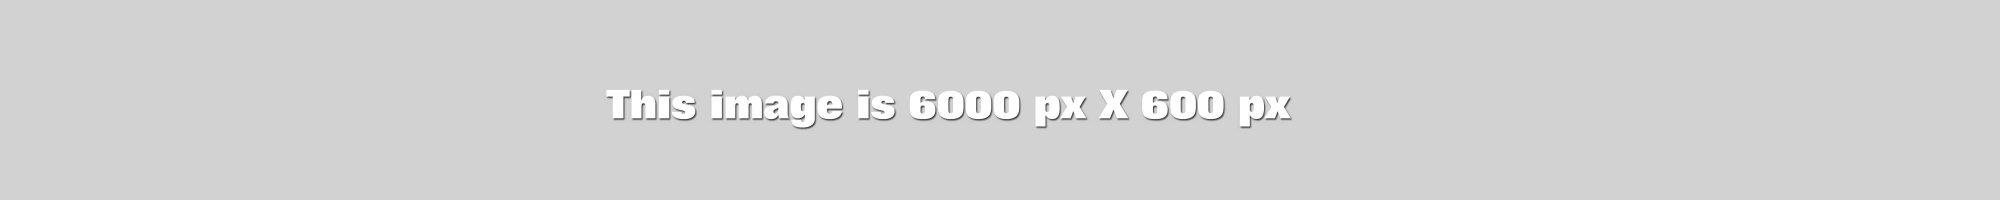 px6000.jpg